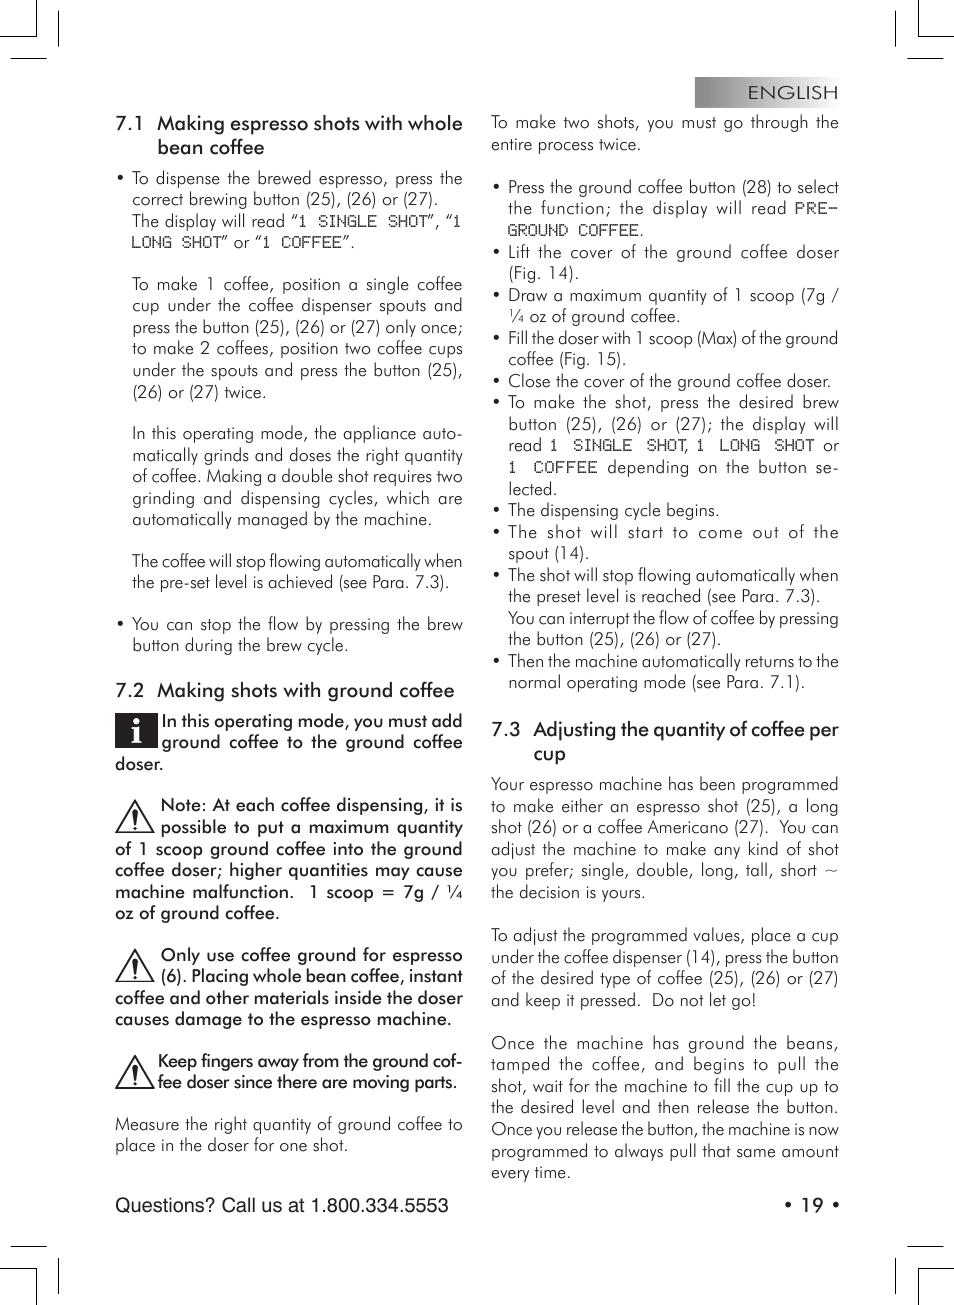 Starbucks Barista SUP021 YDR User Manual   Page 19 / 64